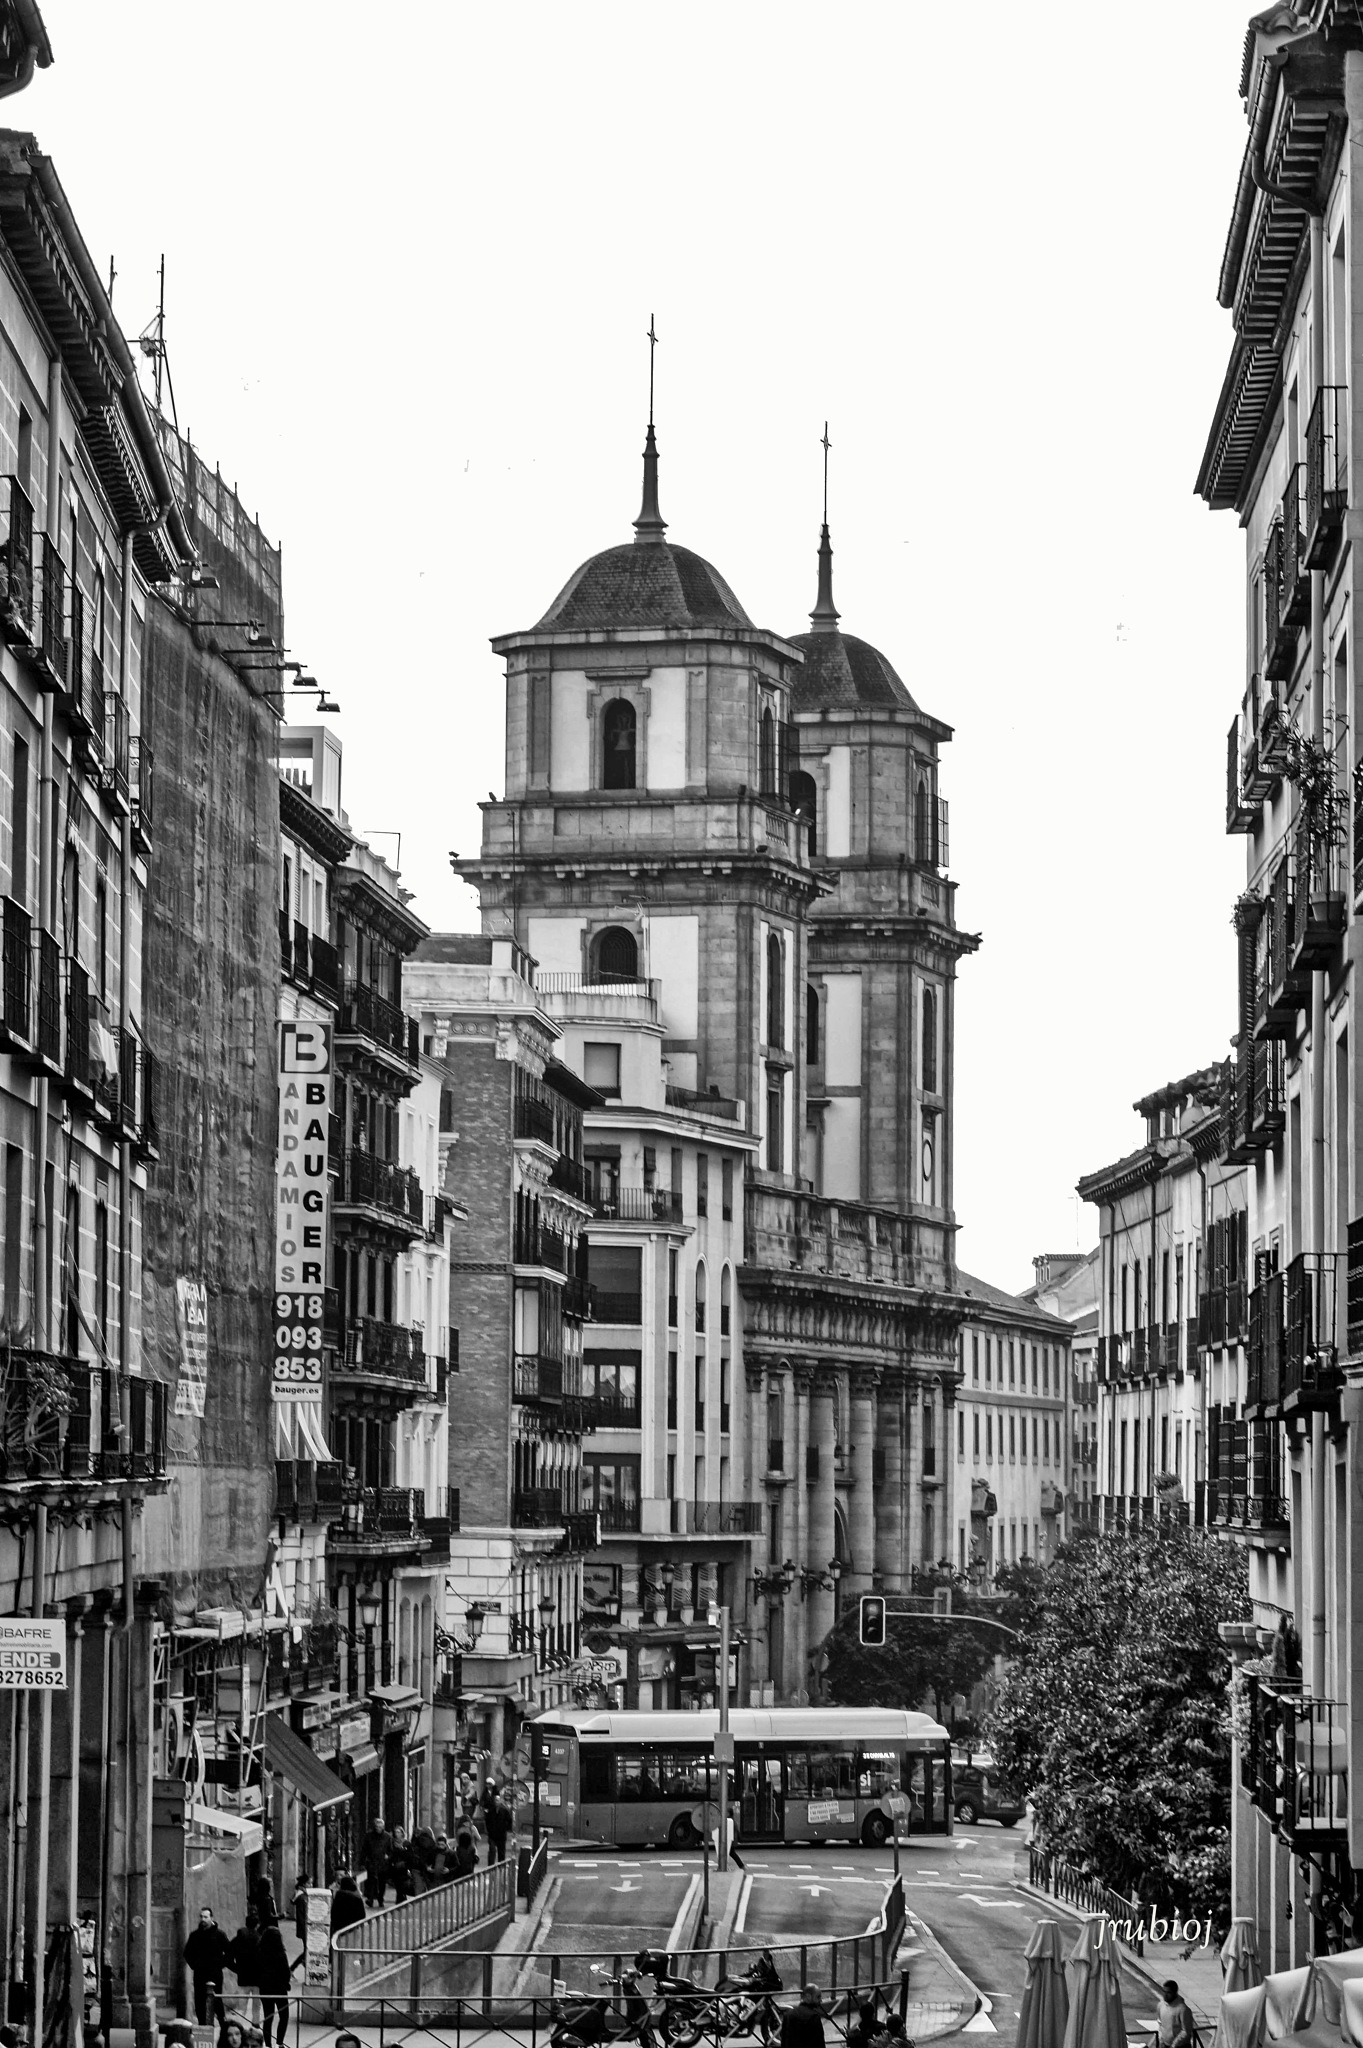 Madrid. by julio rubio